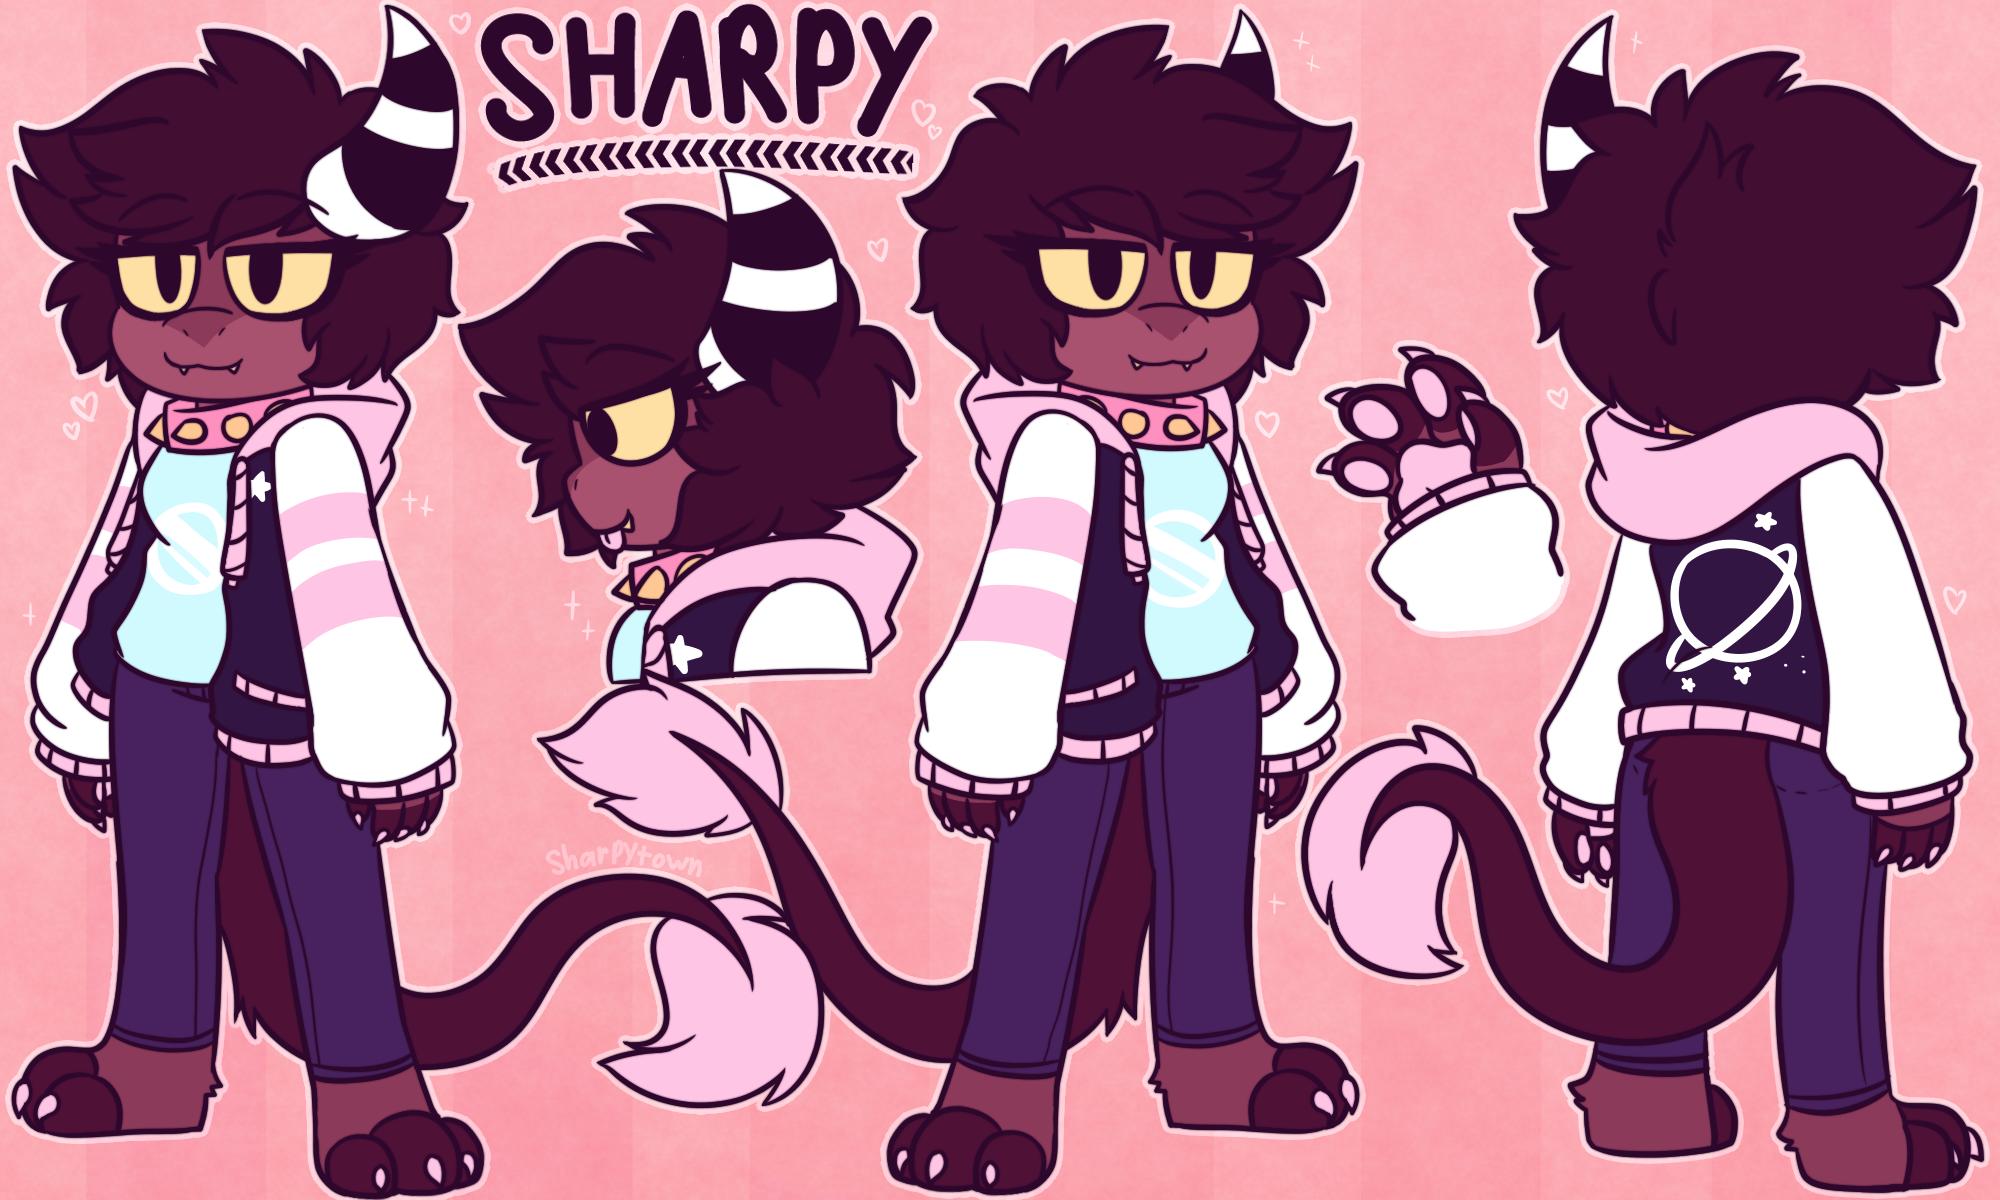 Sharpy